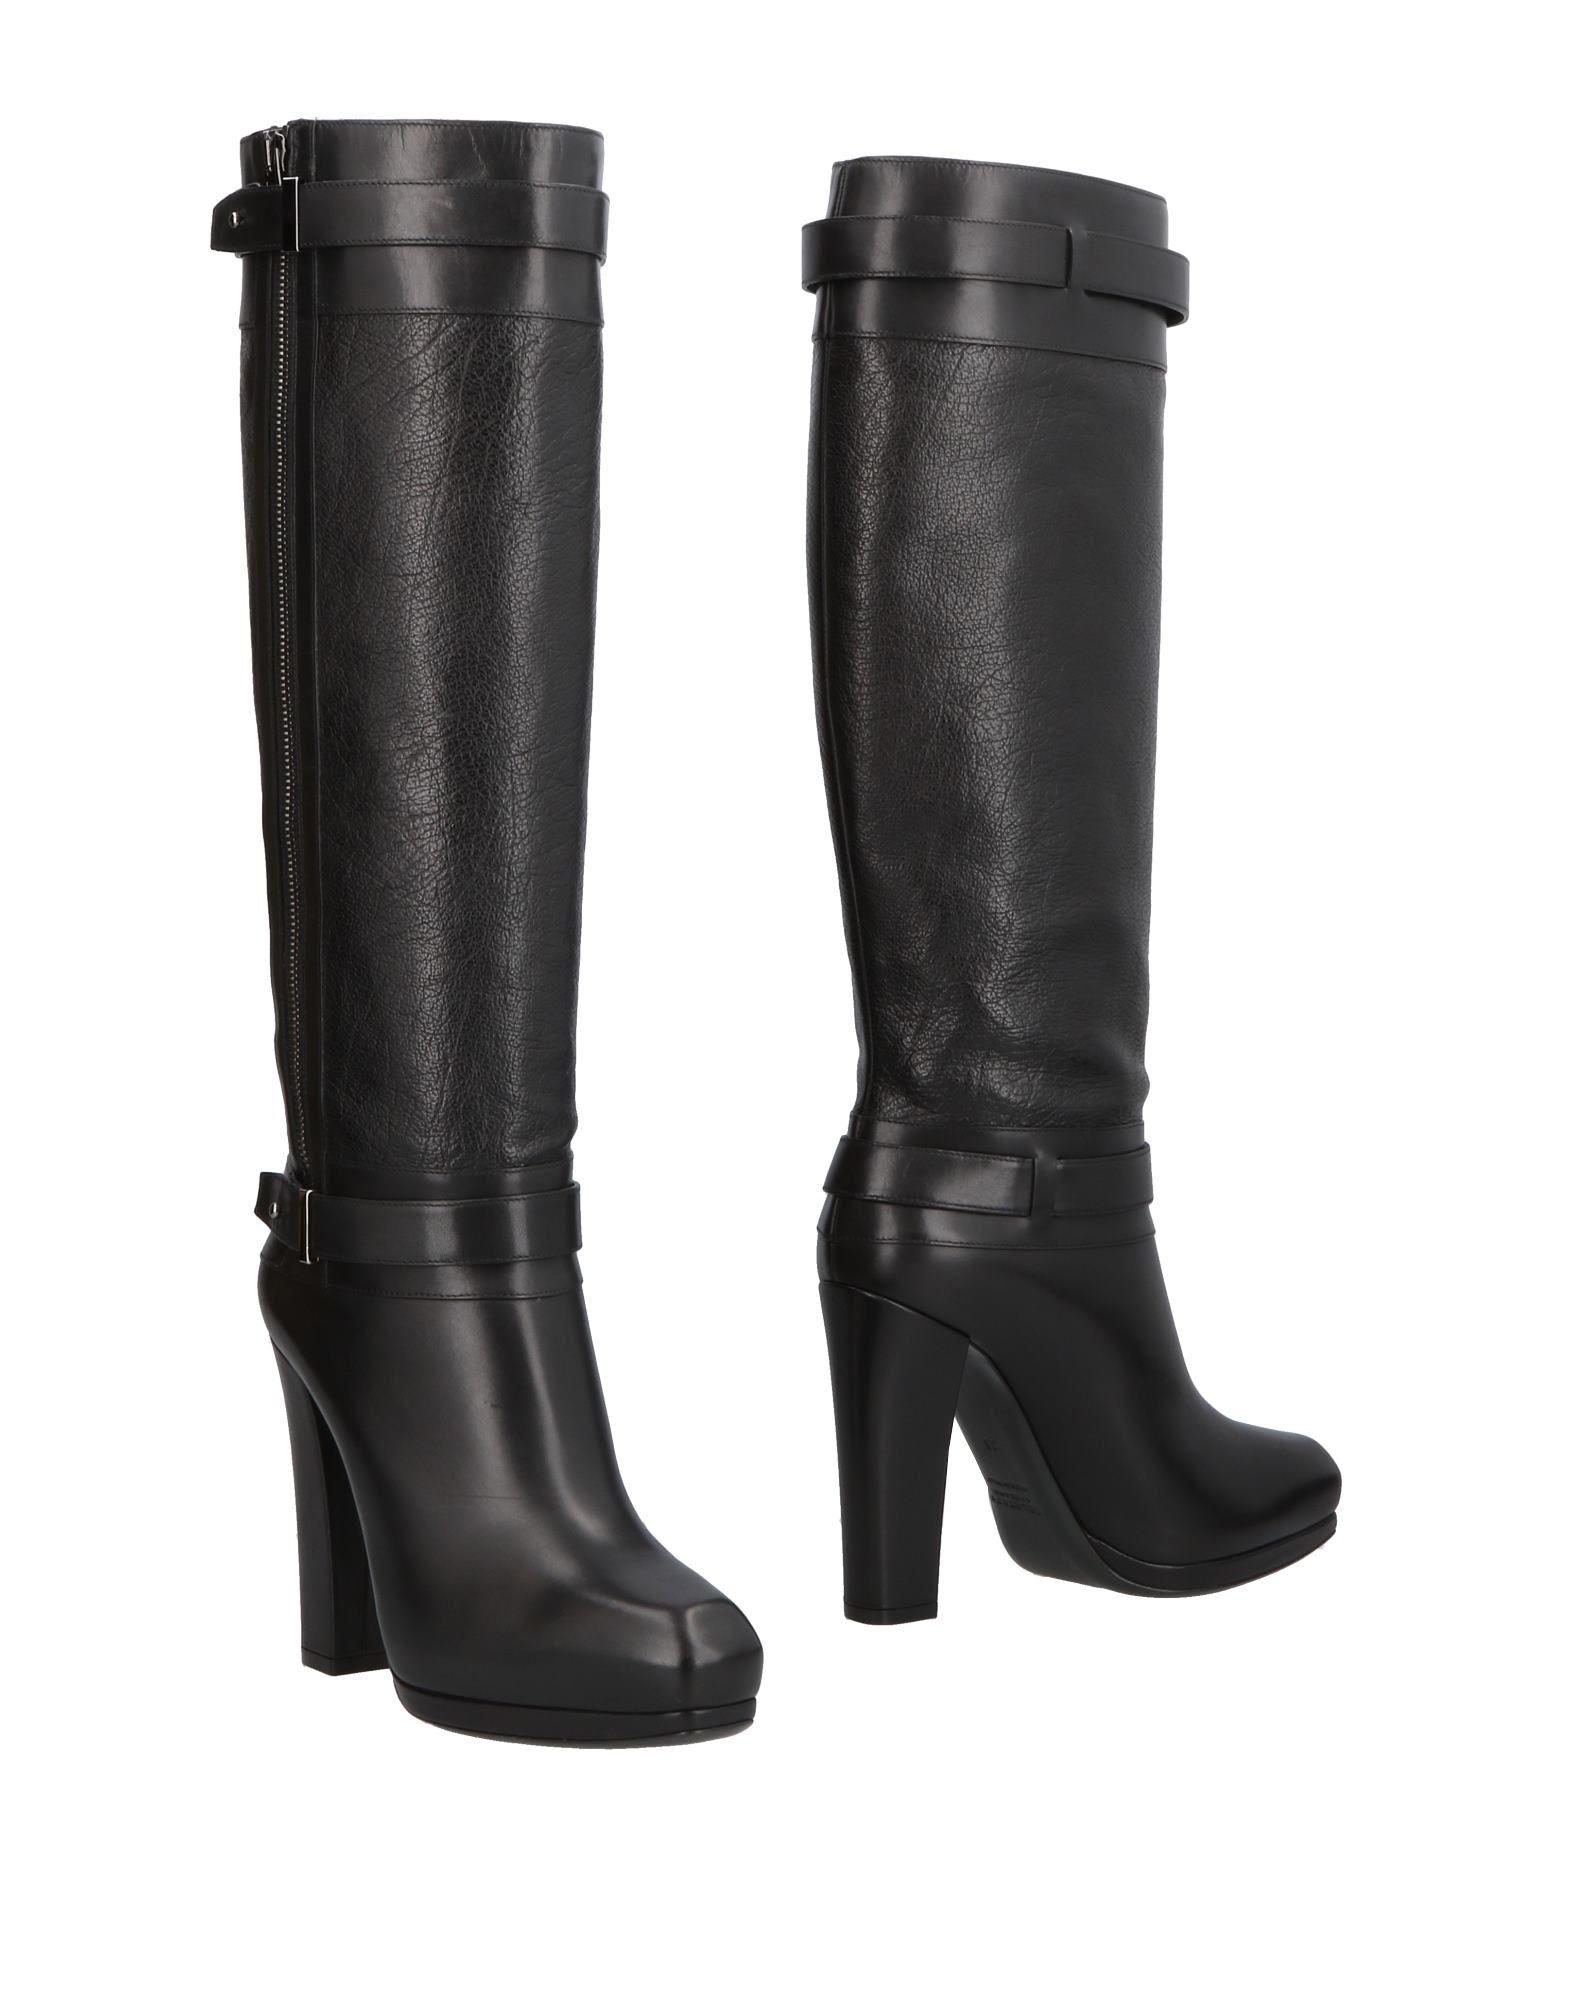 Belstaff Stiefel Damen Schuhe  11503166NBGünstige gut aussehende Schuhe Damen 4049c3